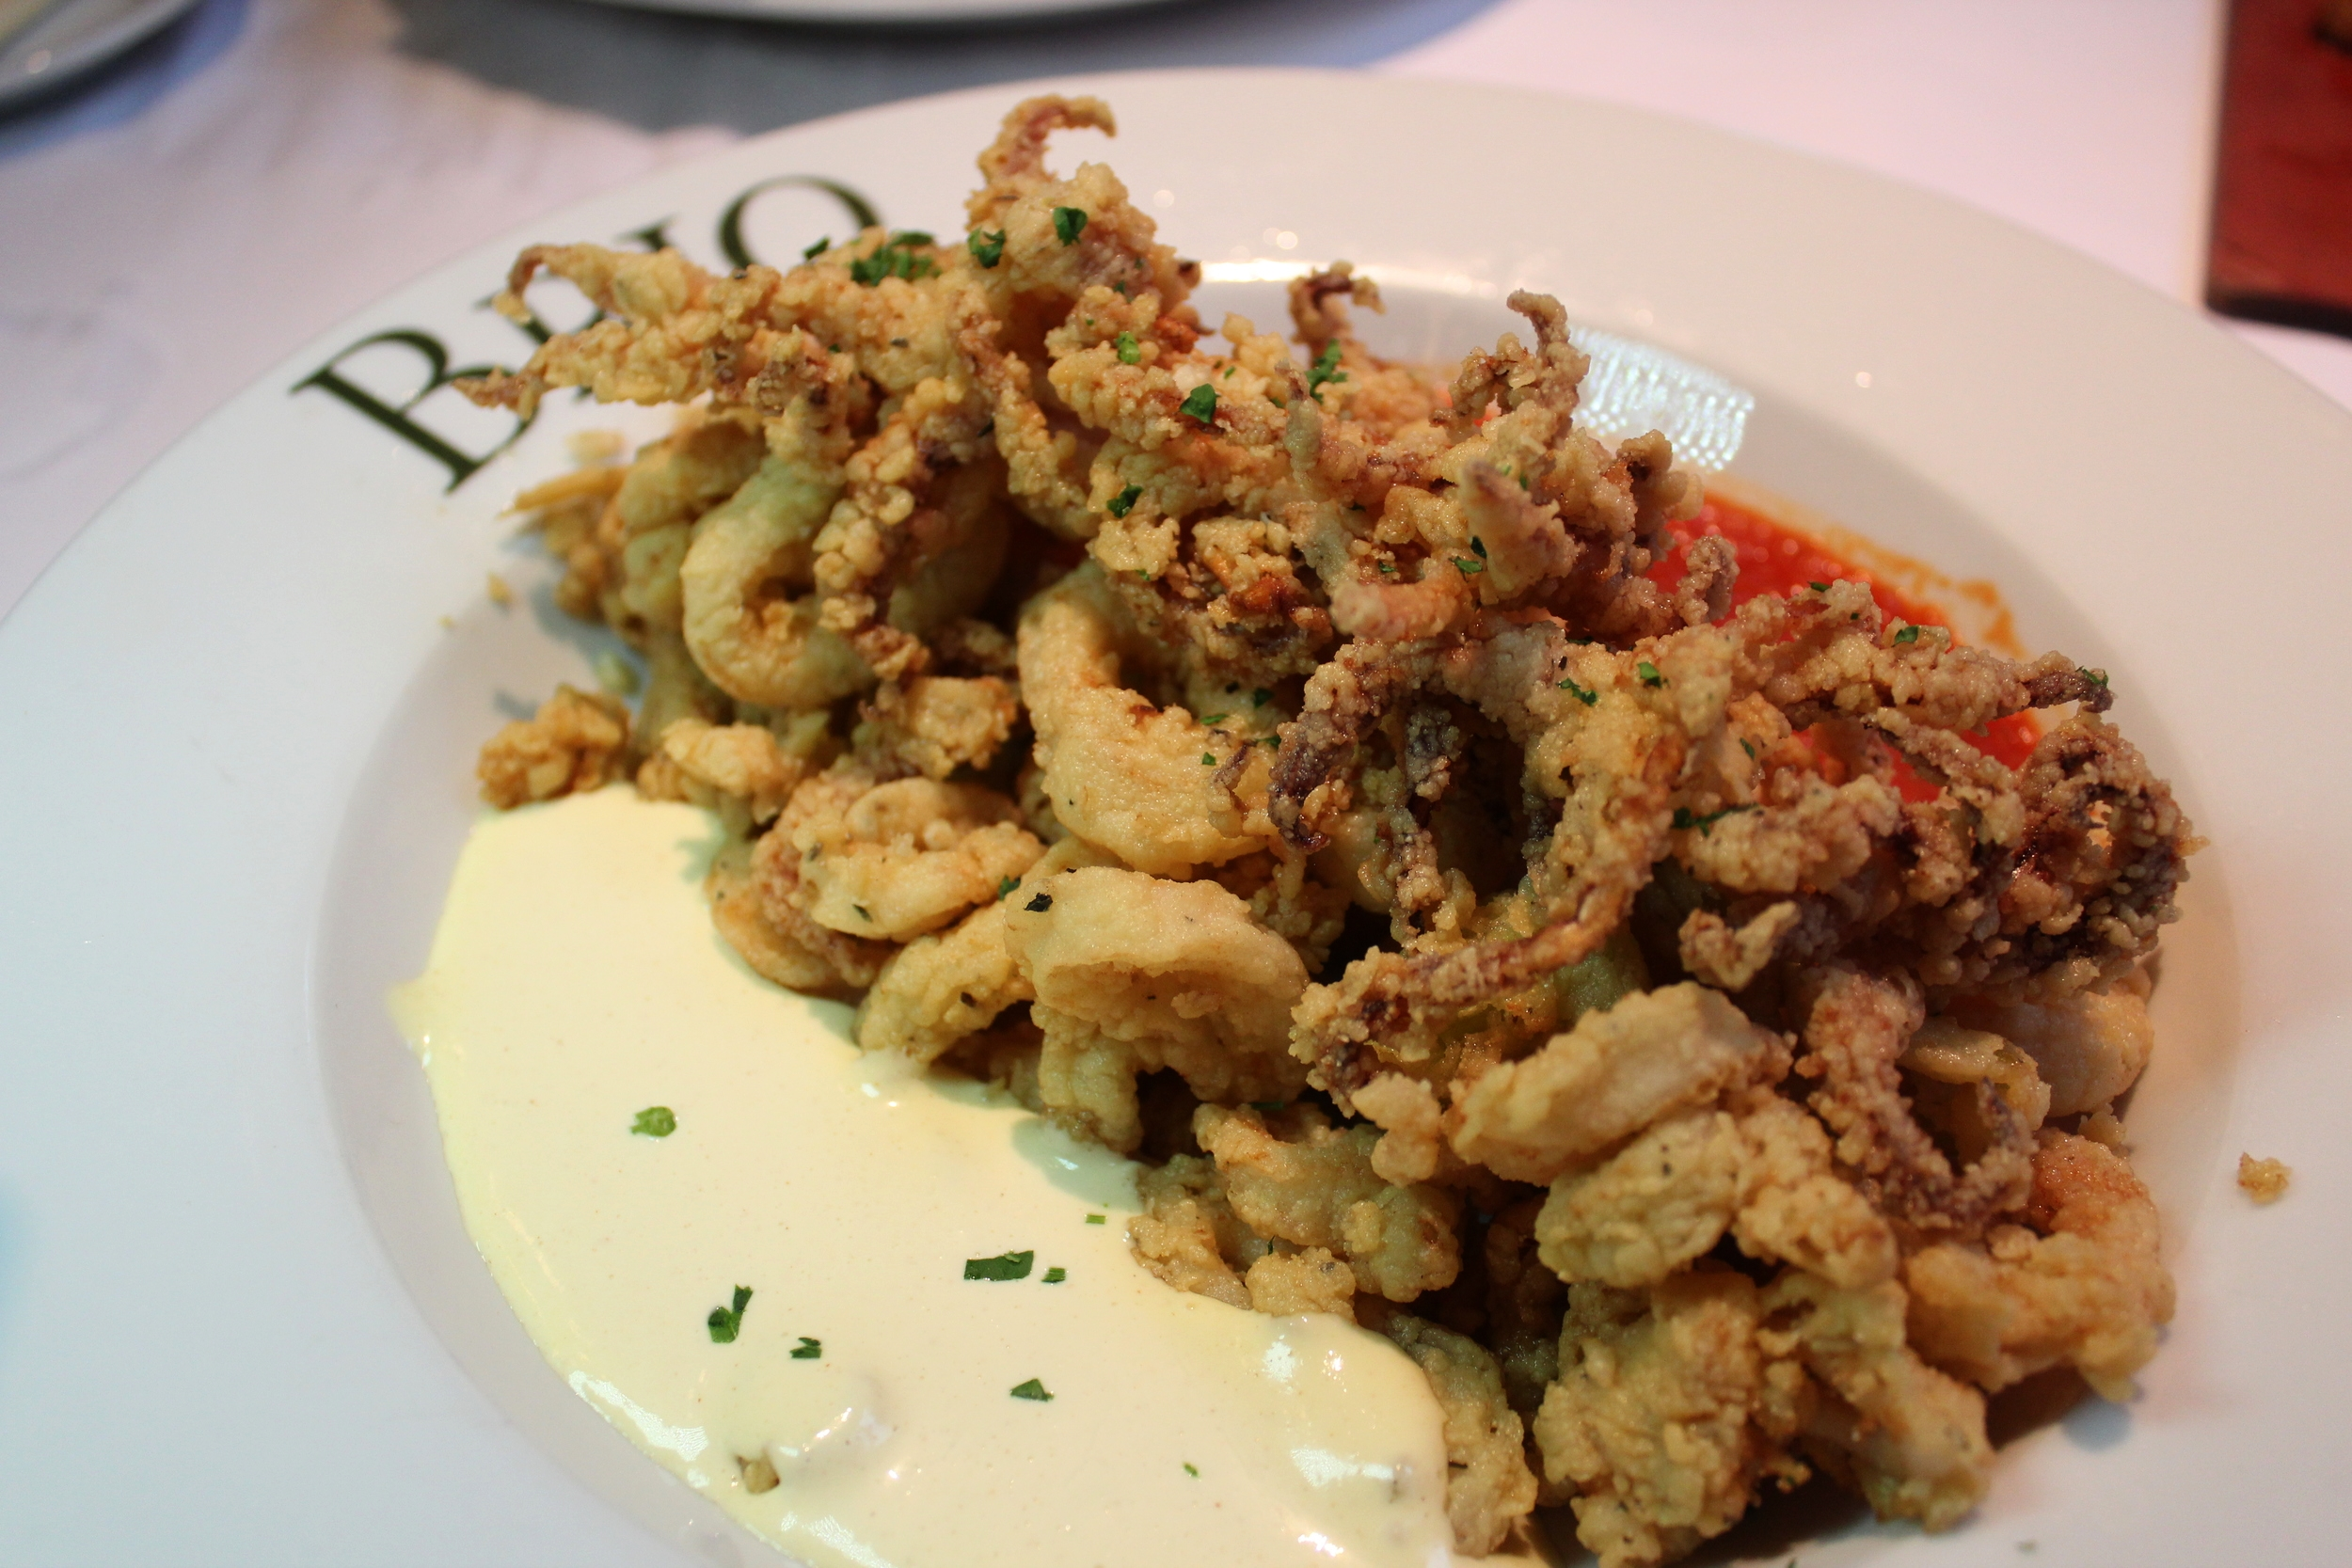 Calamari Fritto Misto Crispy golden brown calamari, peperoncinis served with a creamy aioli and a pomodoro sauce